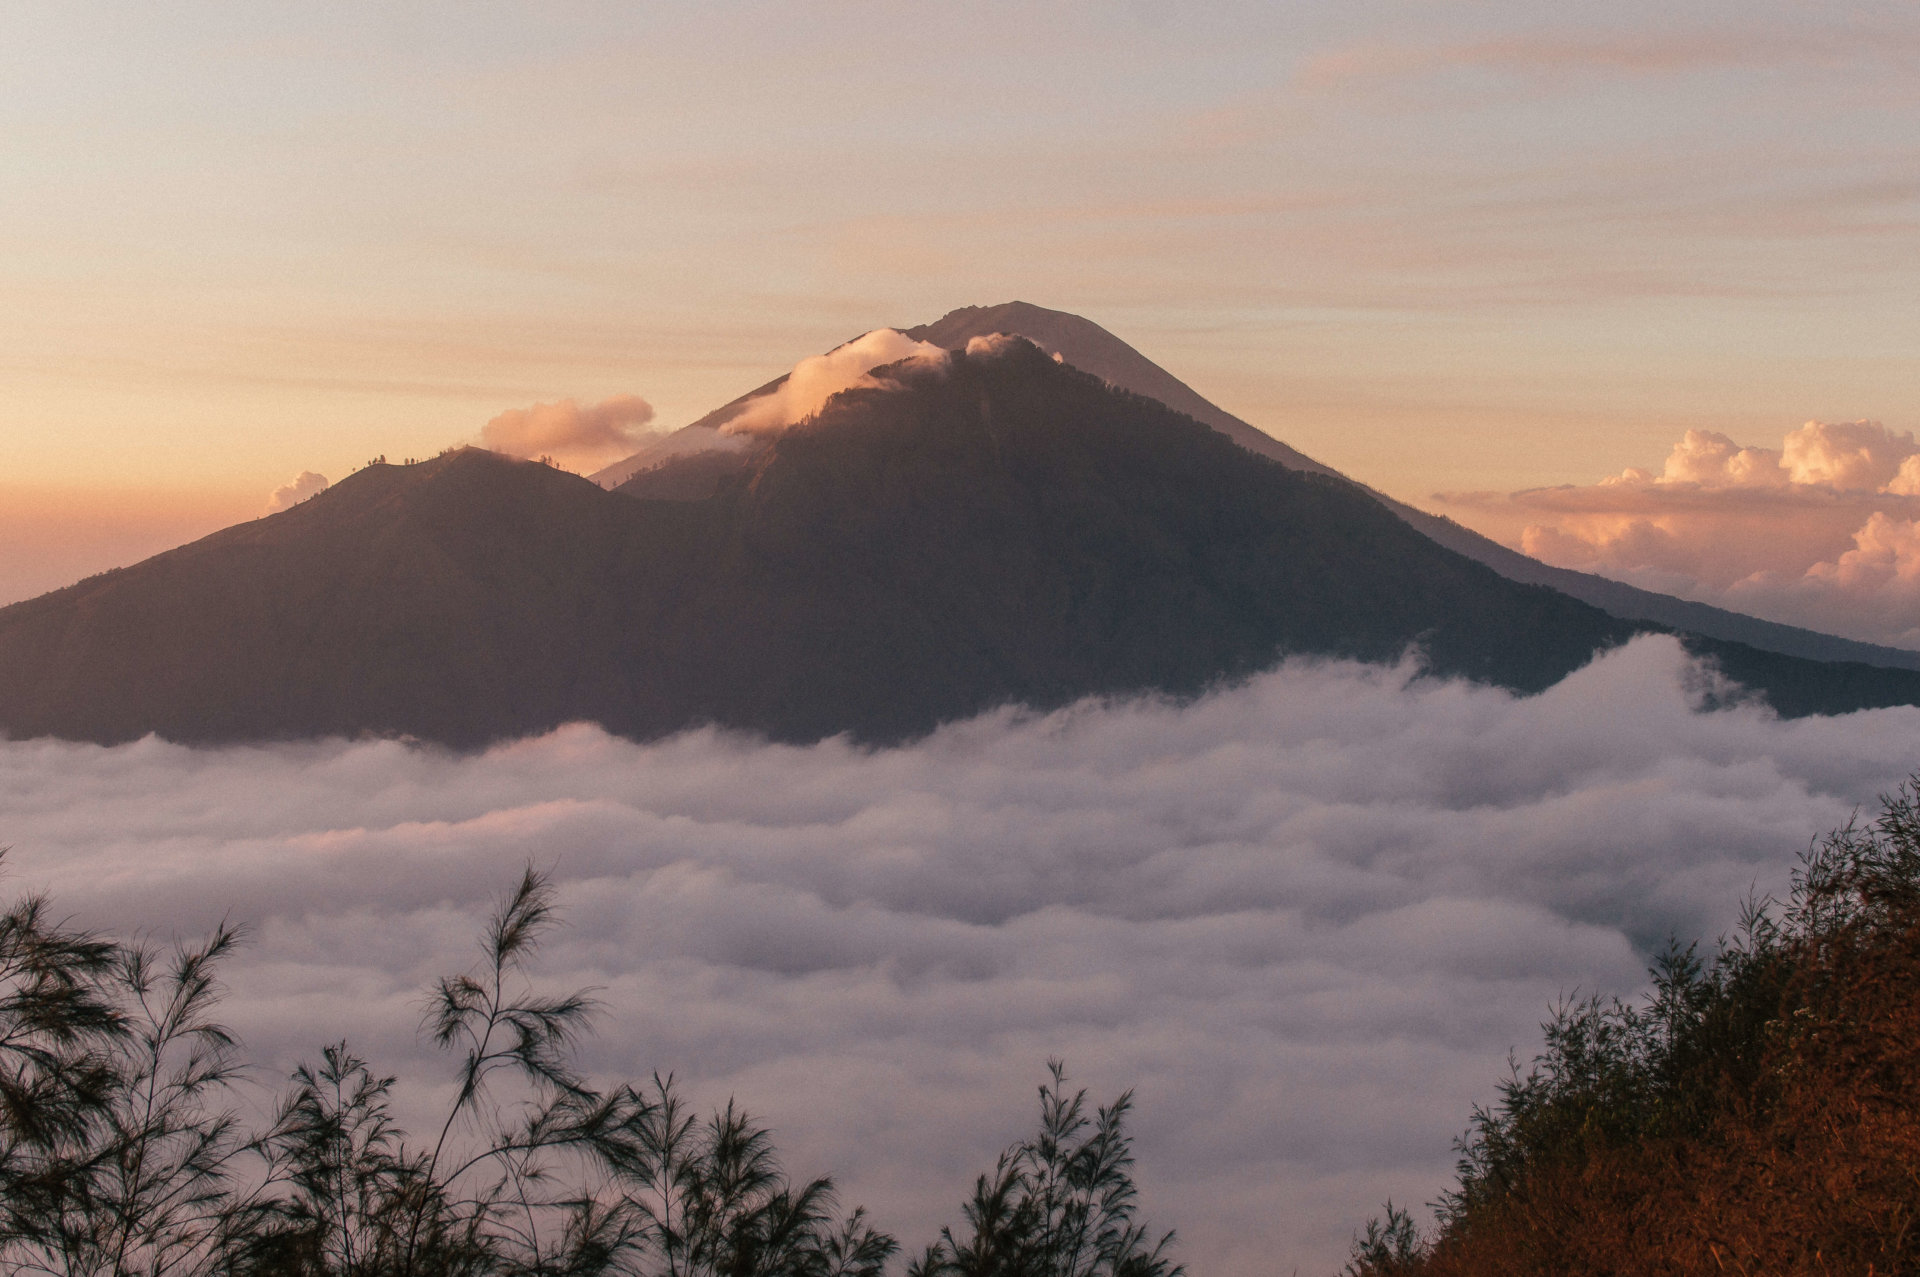 A beautiful mountain at sunrise.